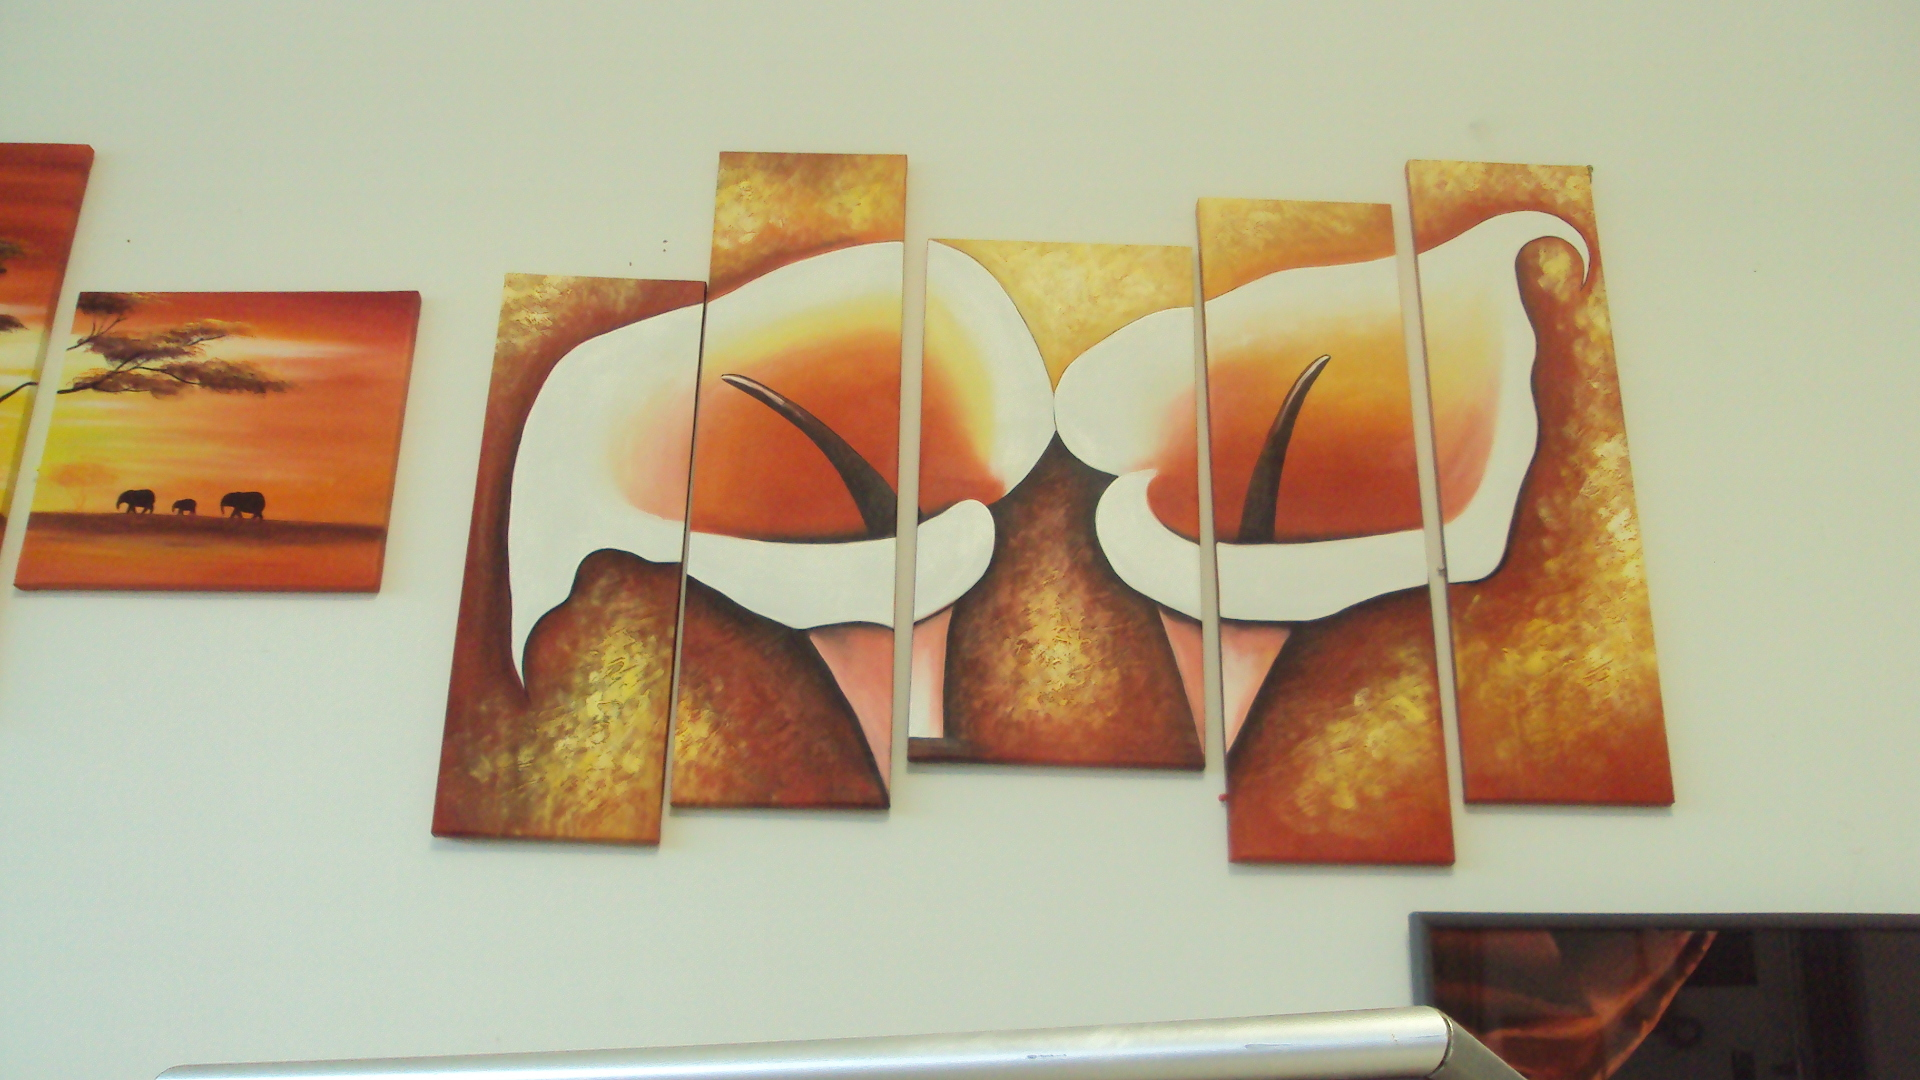 17d081d324fb113a6e39_ebb99ab3d90965525465f734f52c7d0fquad-painting.jpg